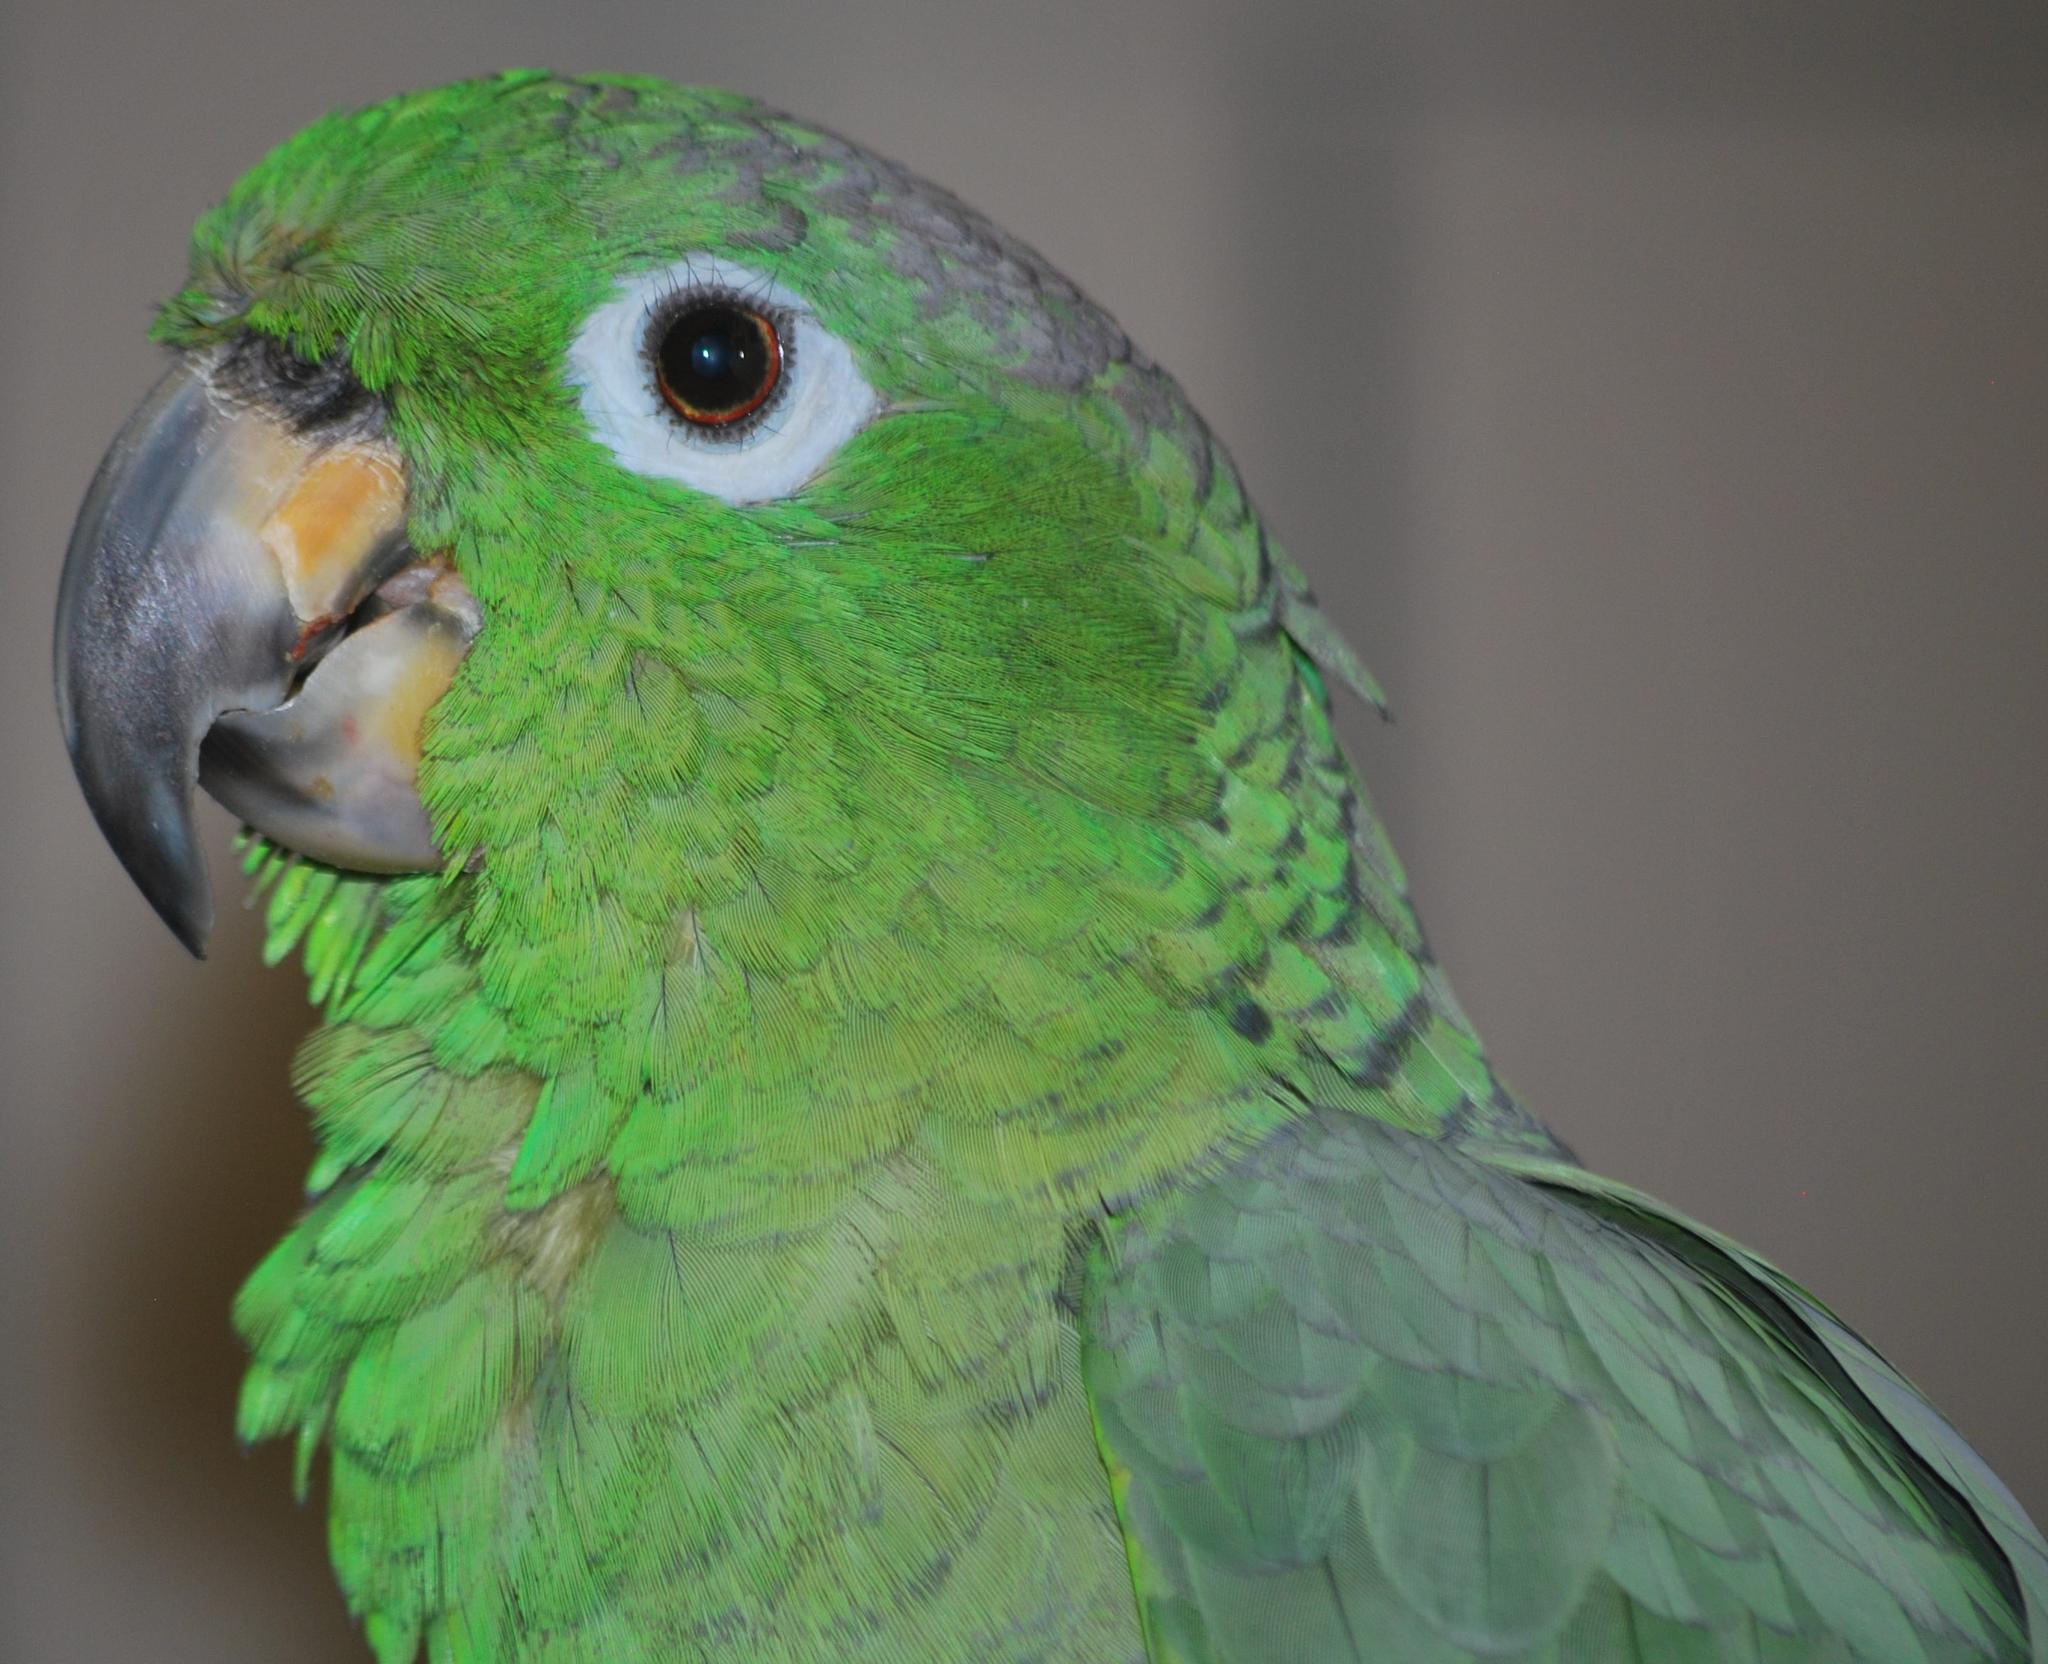 Black billed green amazon parrot by marilyn Simkin